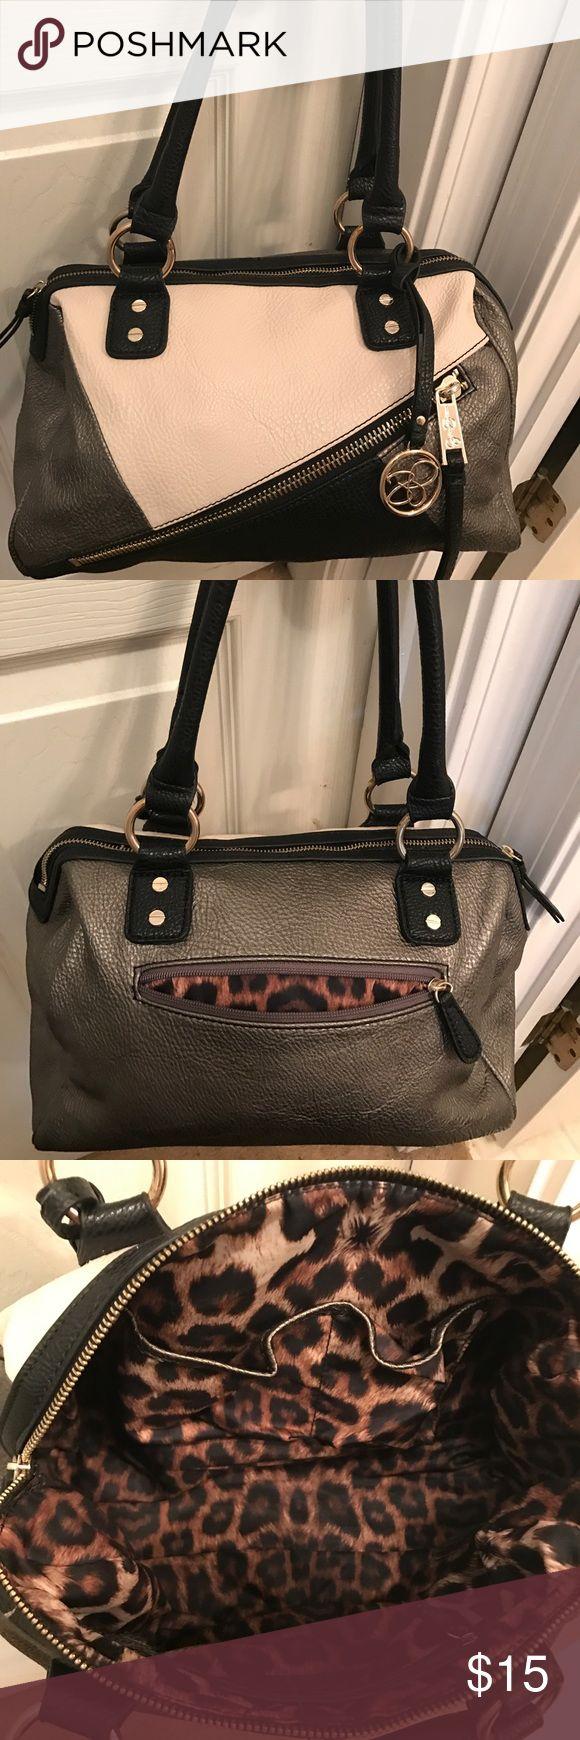 Jessica Simpson handbag Tricolored Jessica Simpson handbag. Very cute! Jessica Simpson Bags Shoulder Bags